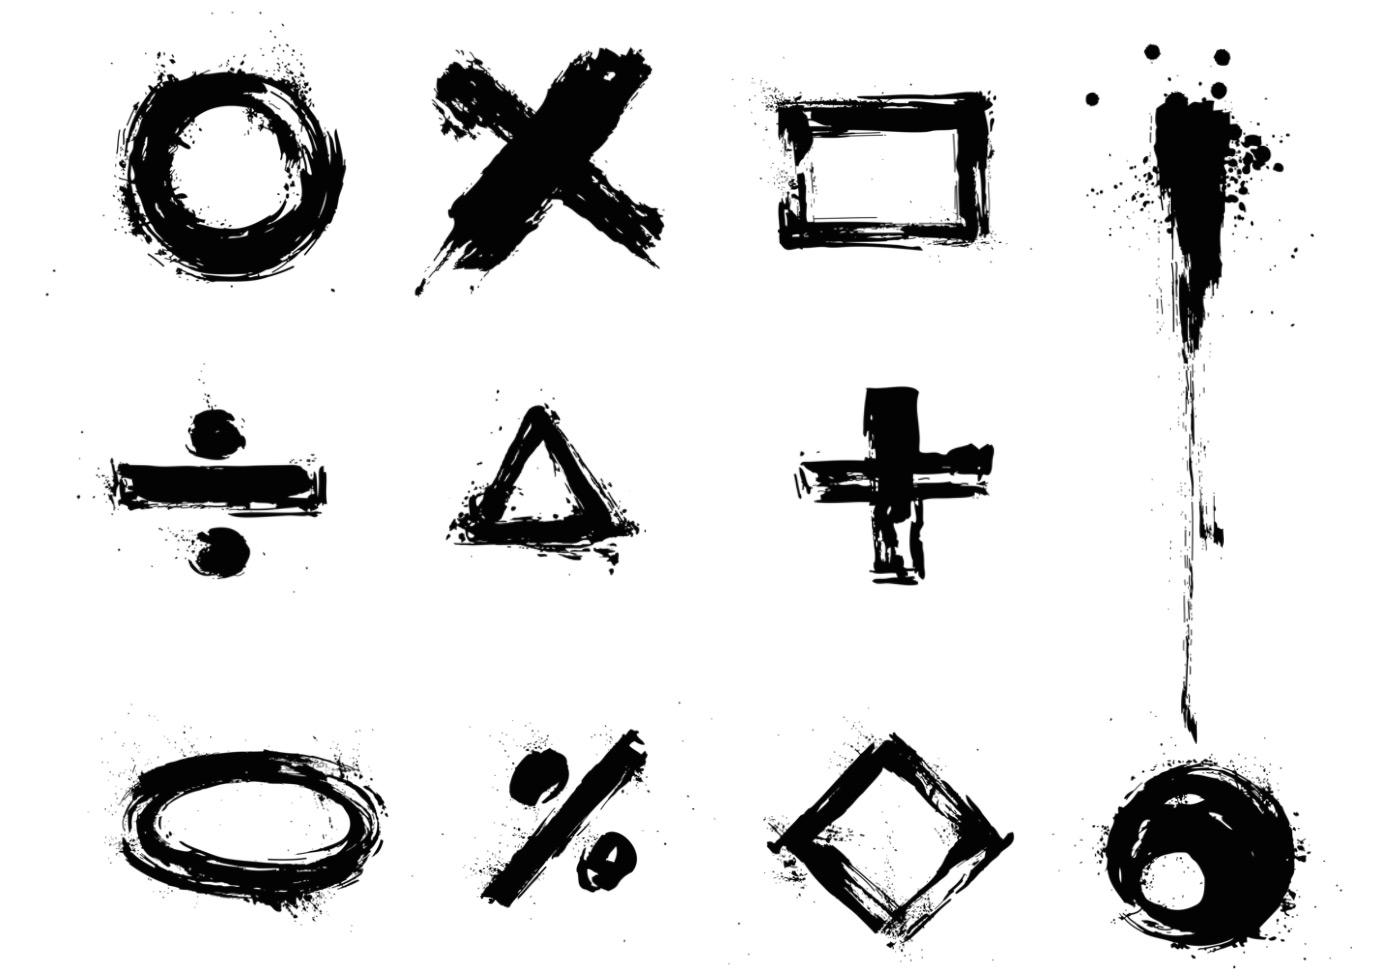 grunge vector sign and symbol pack download free vector art stock rh vecteezy com grunge vector frame grunge vector pack